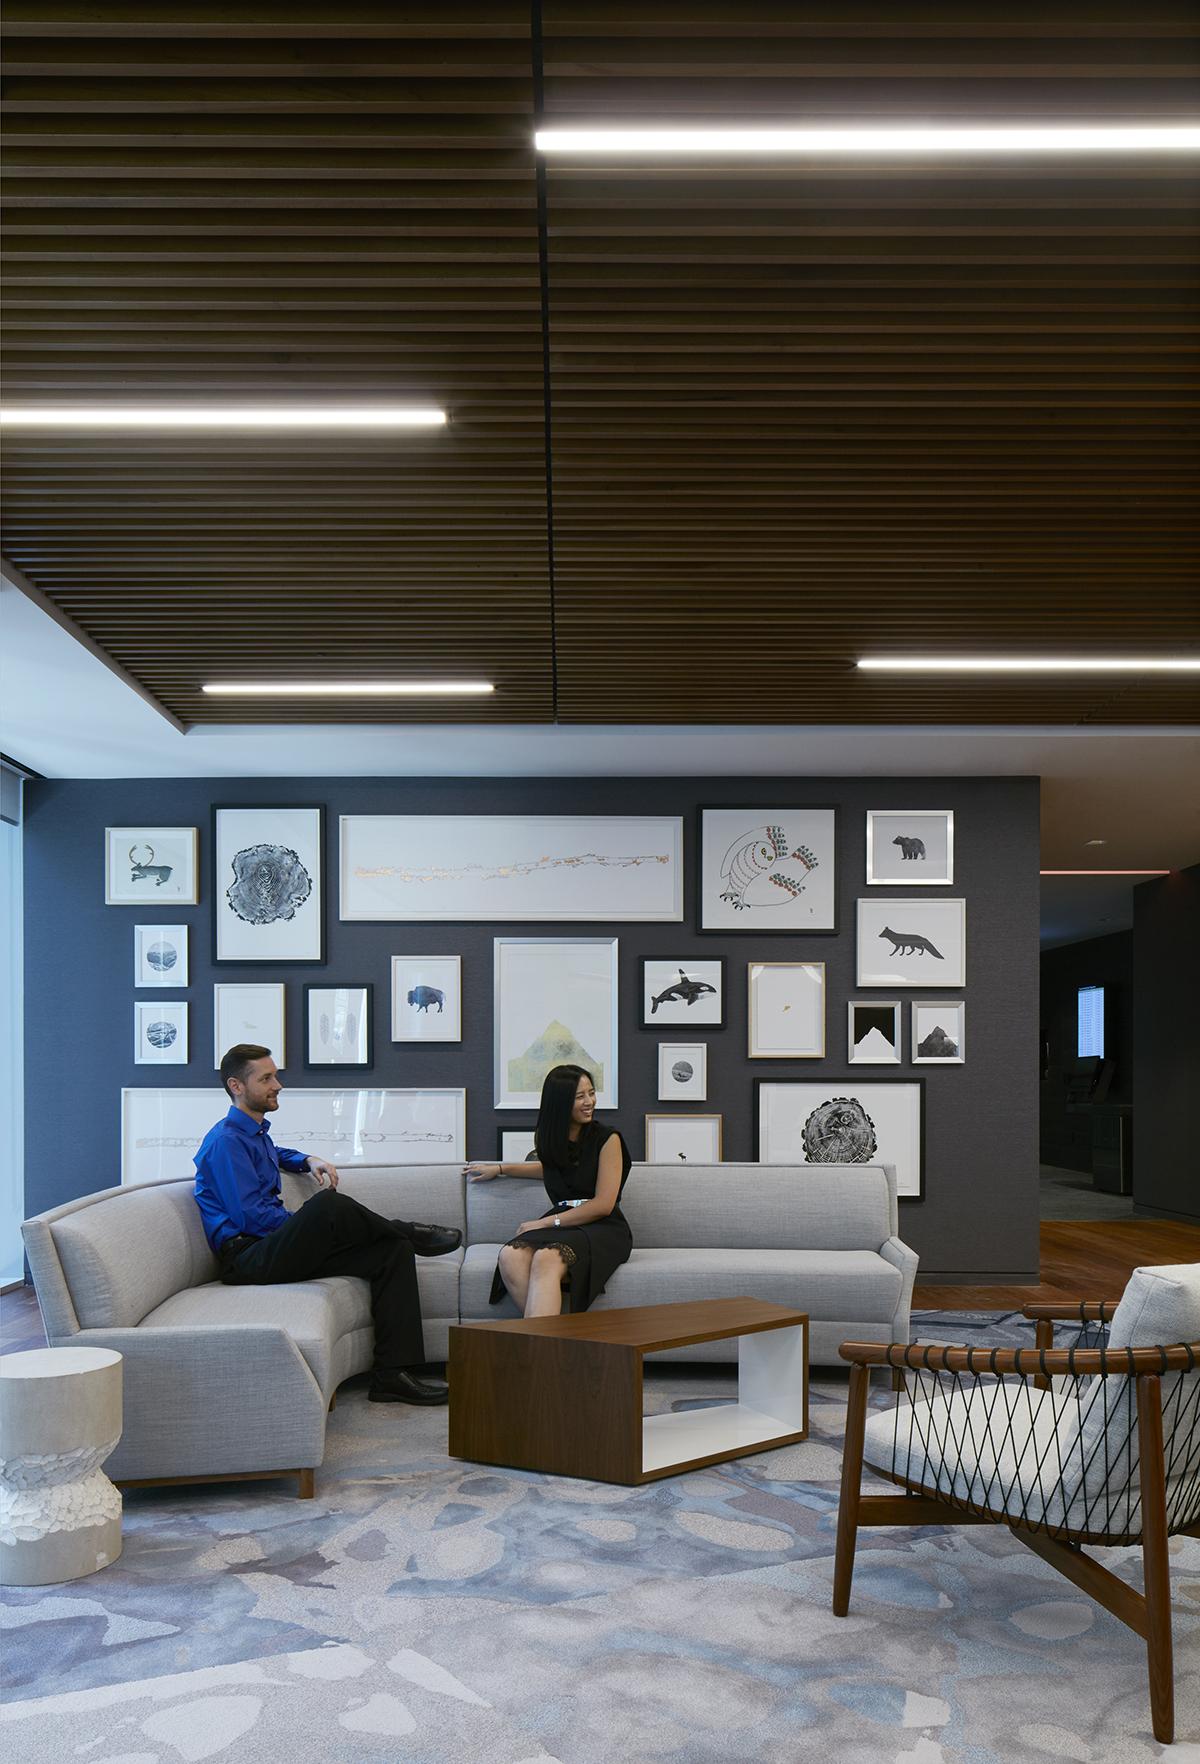 A Tour Of Deloitte Rsquo S New Sleek Toronto Office Officelovin